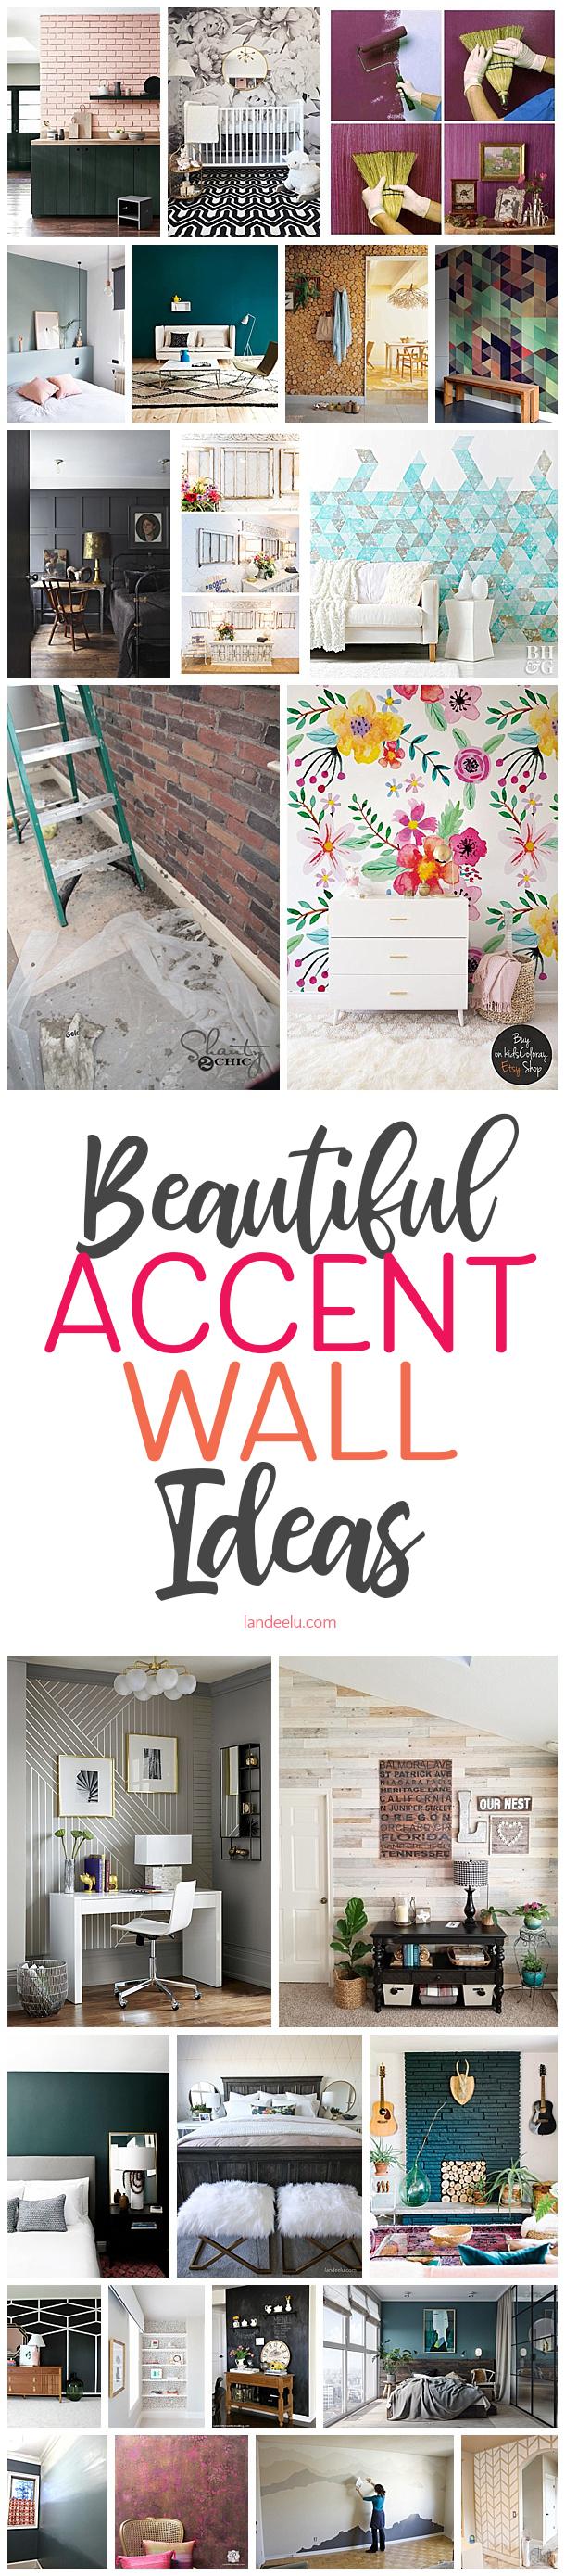 I love these accent wall ideas! So pretty!